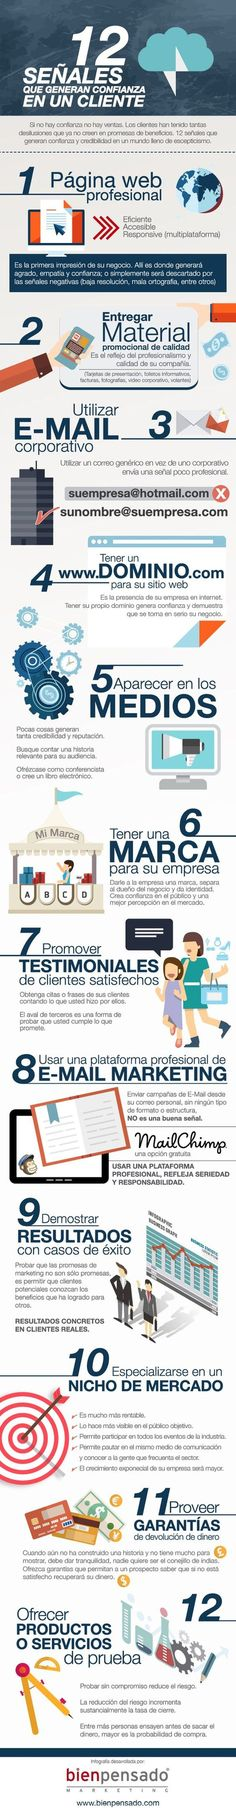 5 Types of Marketing Strategies Proven to Work Online - The Kings Marketing Inbound Marketing, Marketing Online, Marketing And Advertising, Business Marketing, Content Marketing, Internet Marketing, Social Media Marketing, Design Social, Web Design